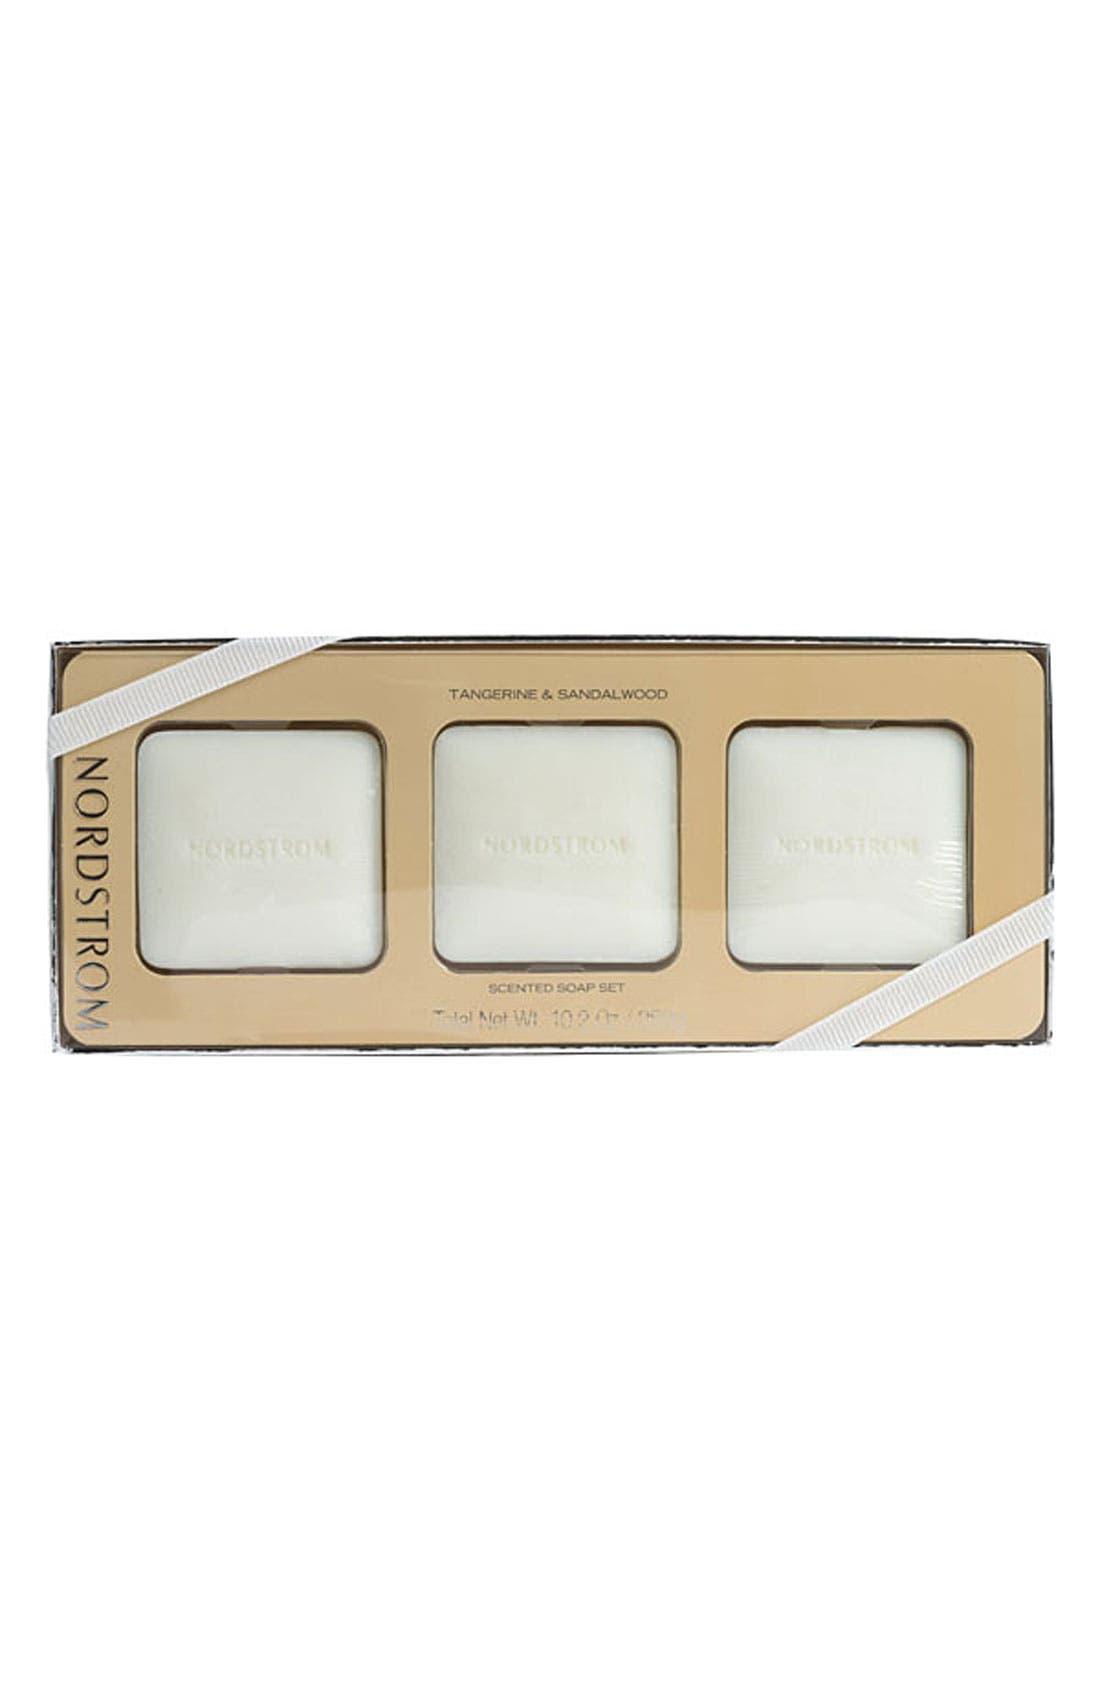 Main Image - Nordstrom 'Tangerine Flower & Sandalwood' Scented Soap Set